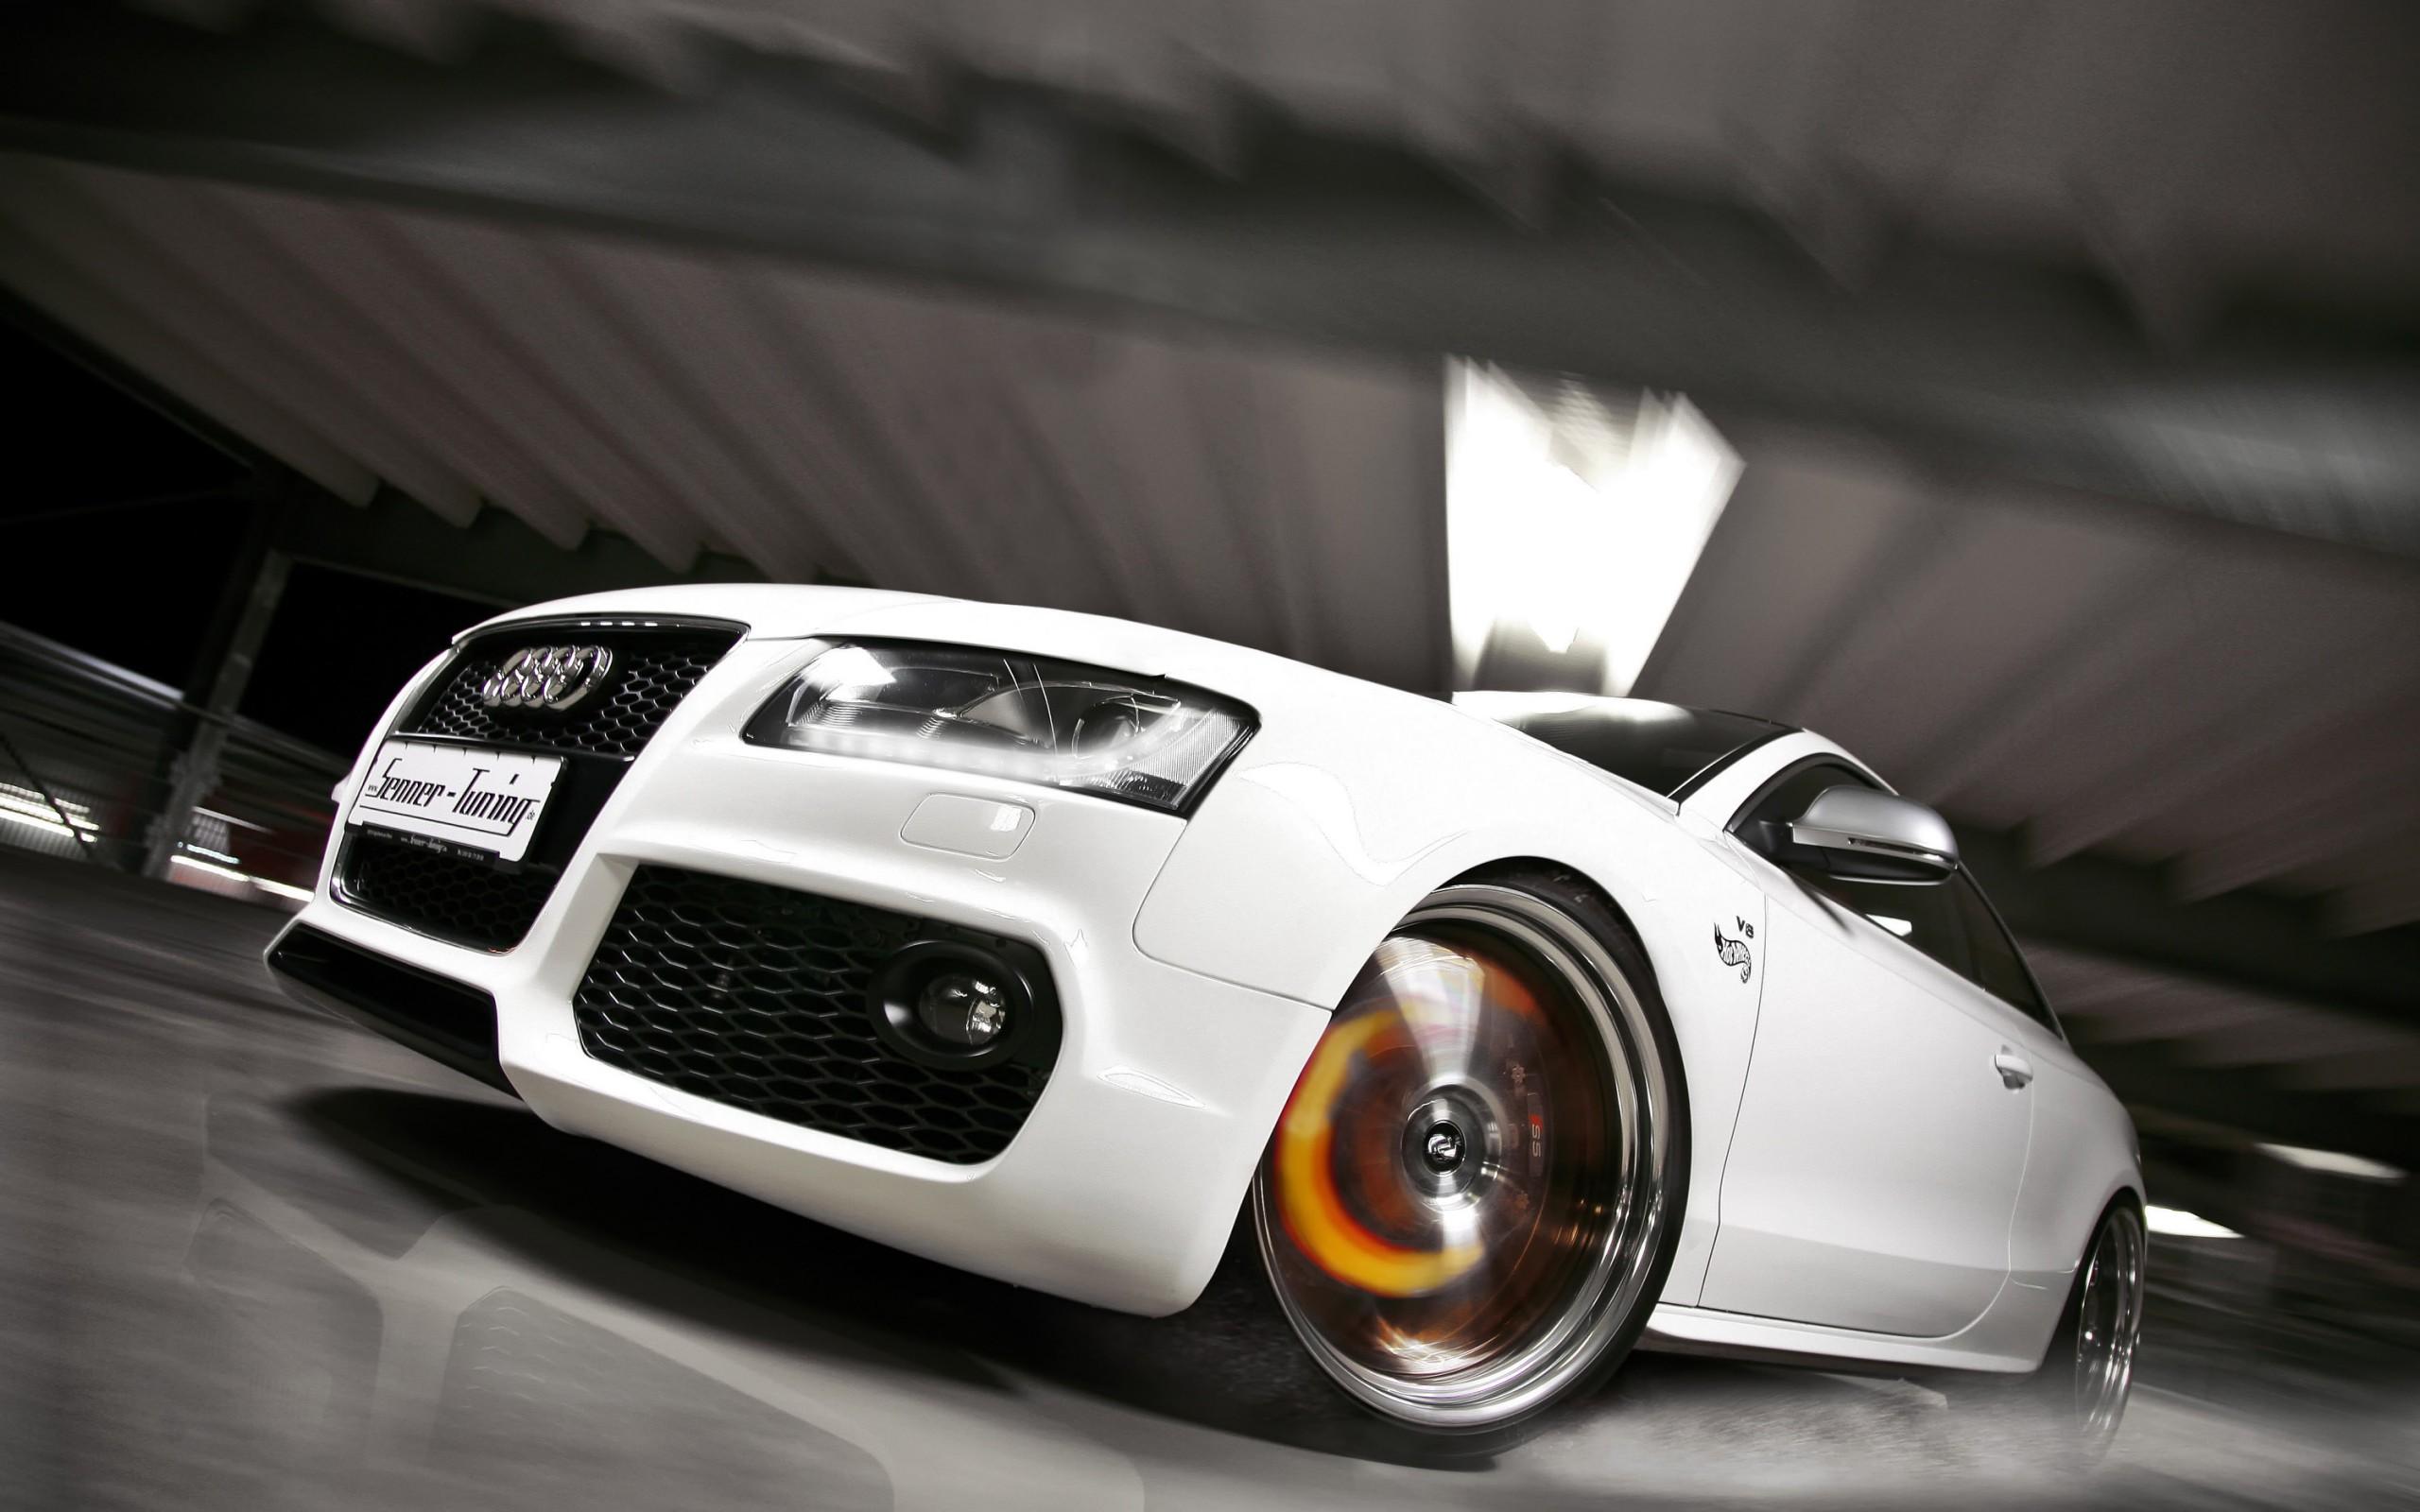 Senner Audi S5 2010 01 HD Wallpaper